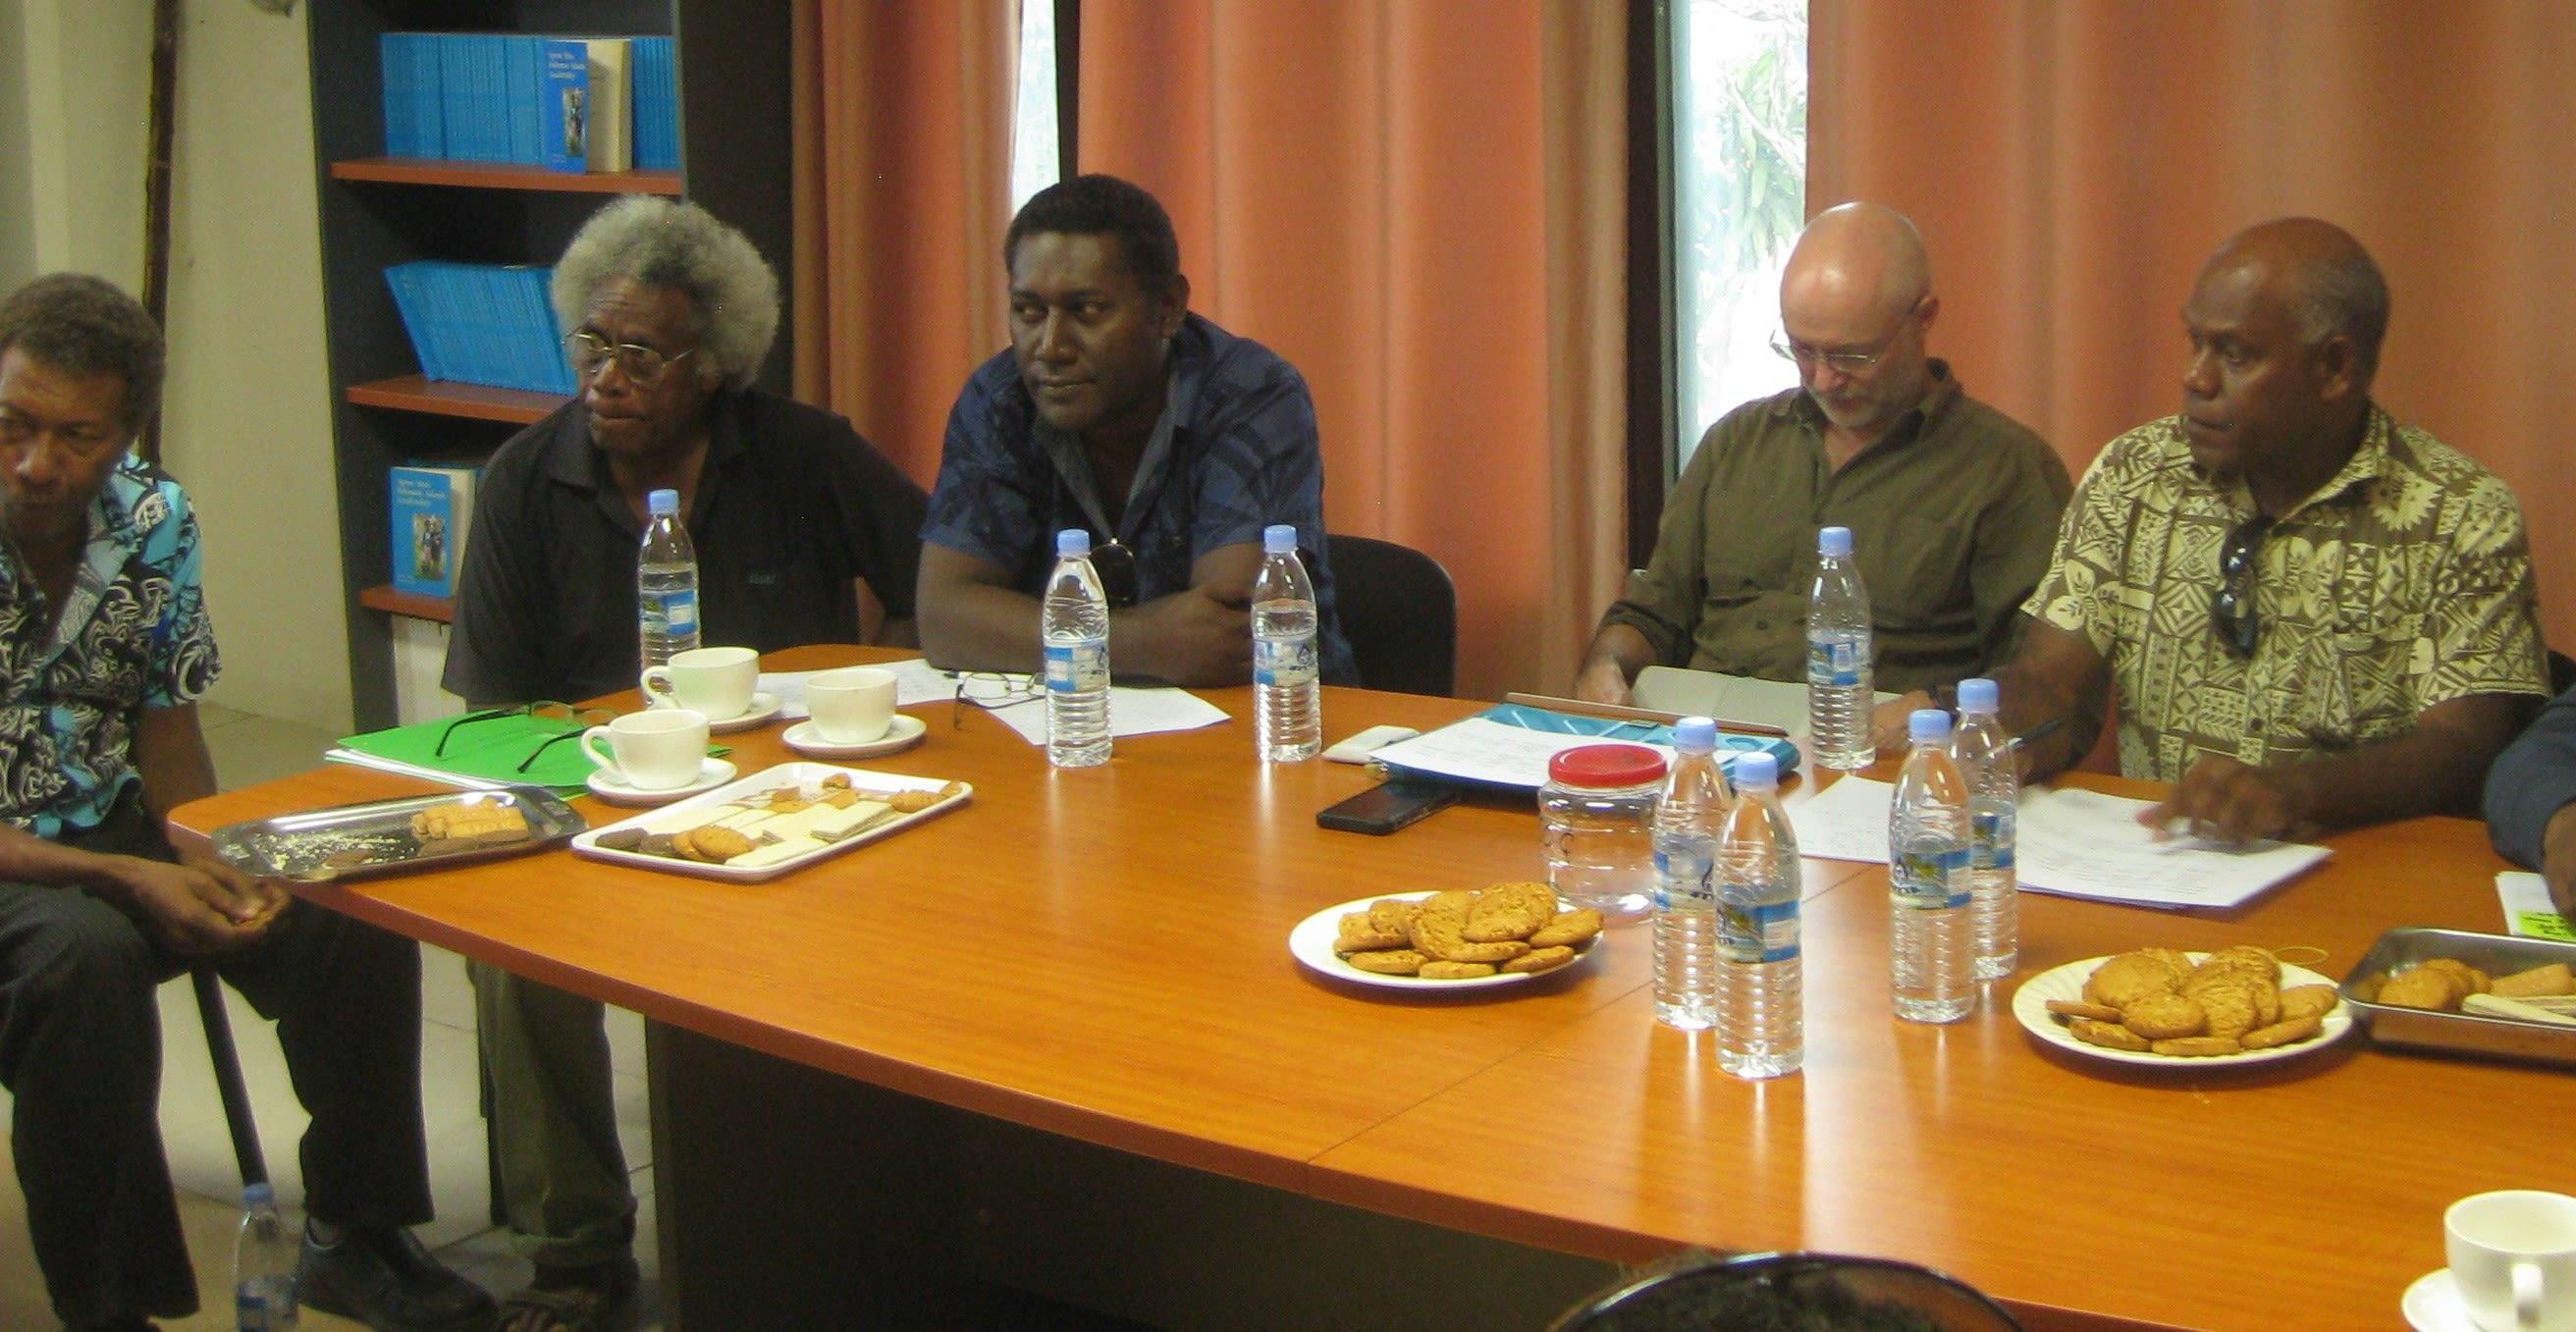 Tok stori in action in Solomon Islands